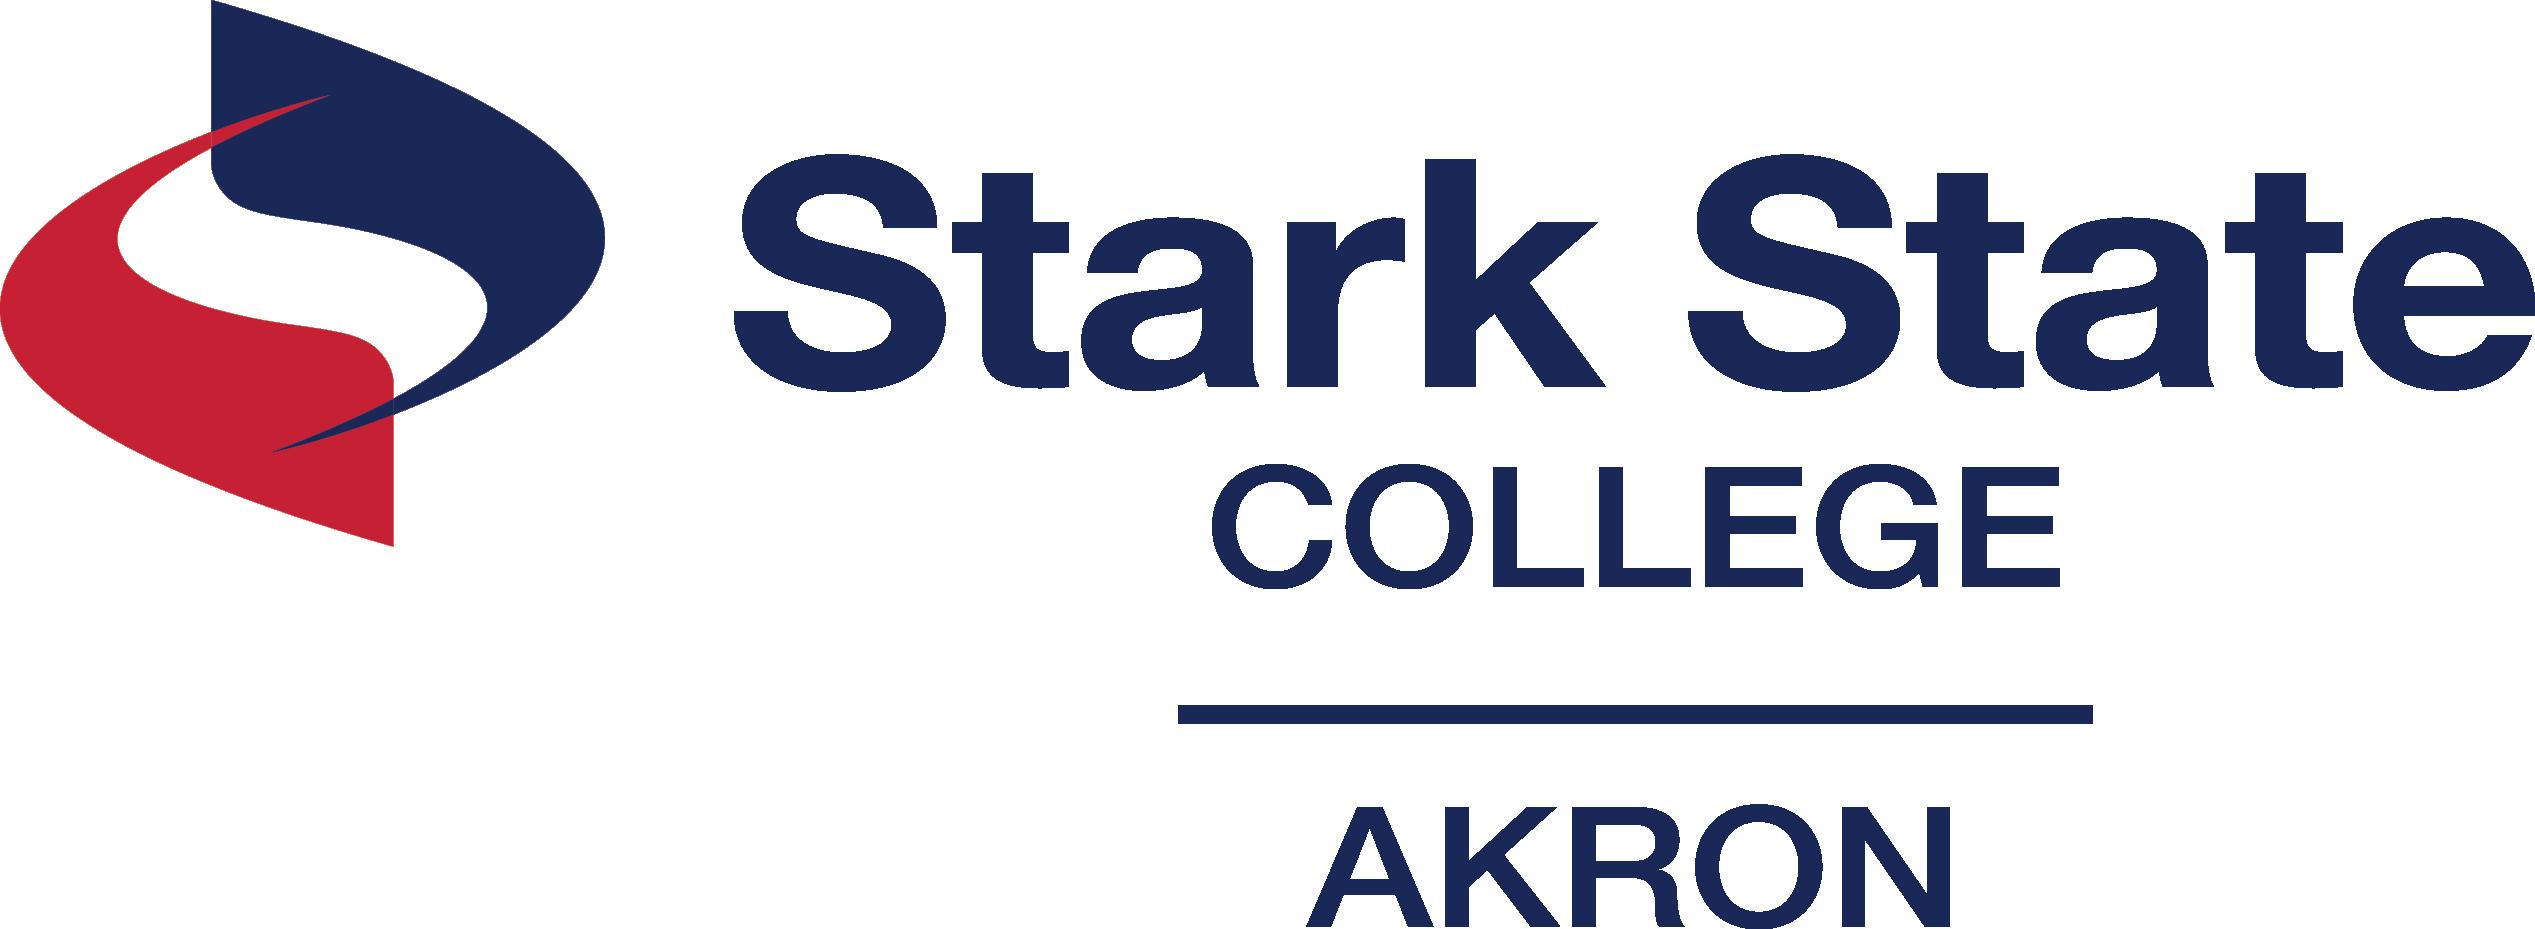 Stark State College - Akron Logo